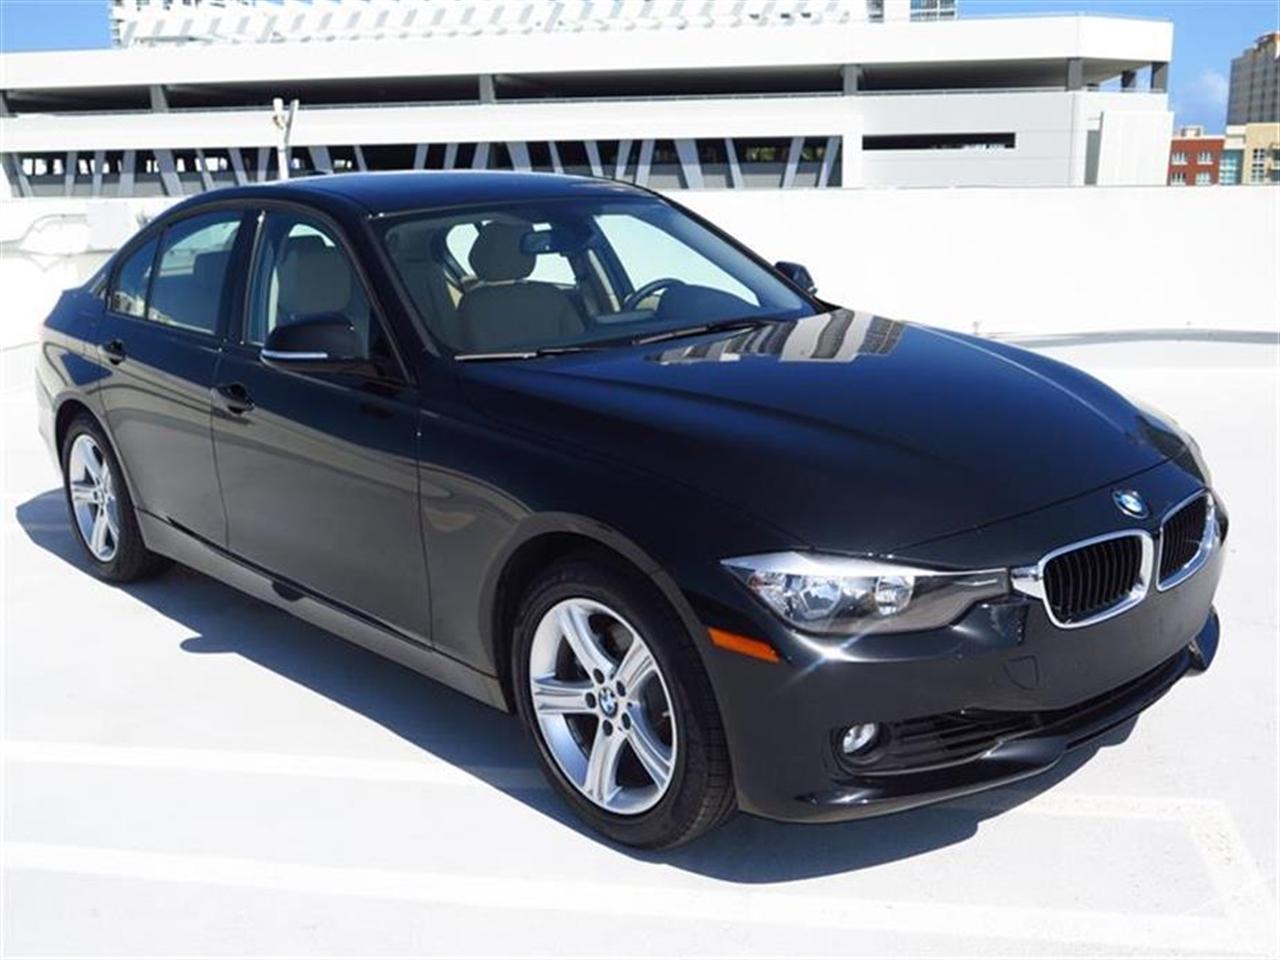 2015 BMW 3 SERIES 4dr Sdn 328i RWD 8234 miles 2 Seatback Storage Pockets 4 12V DC Power Outlets